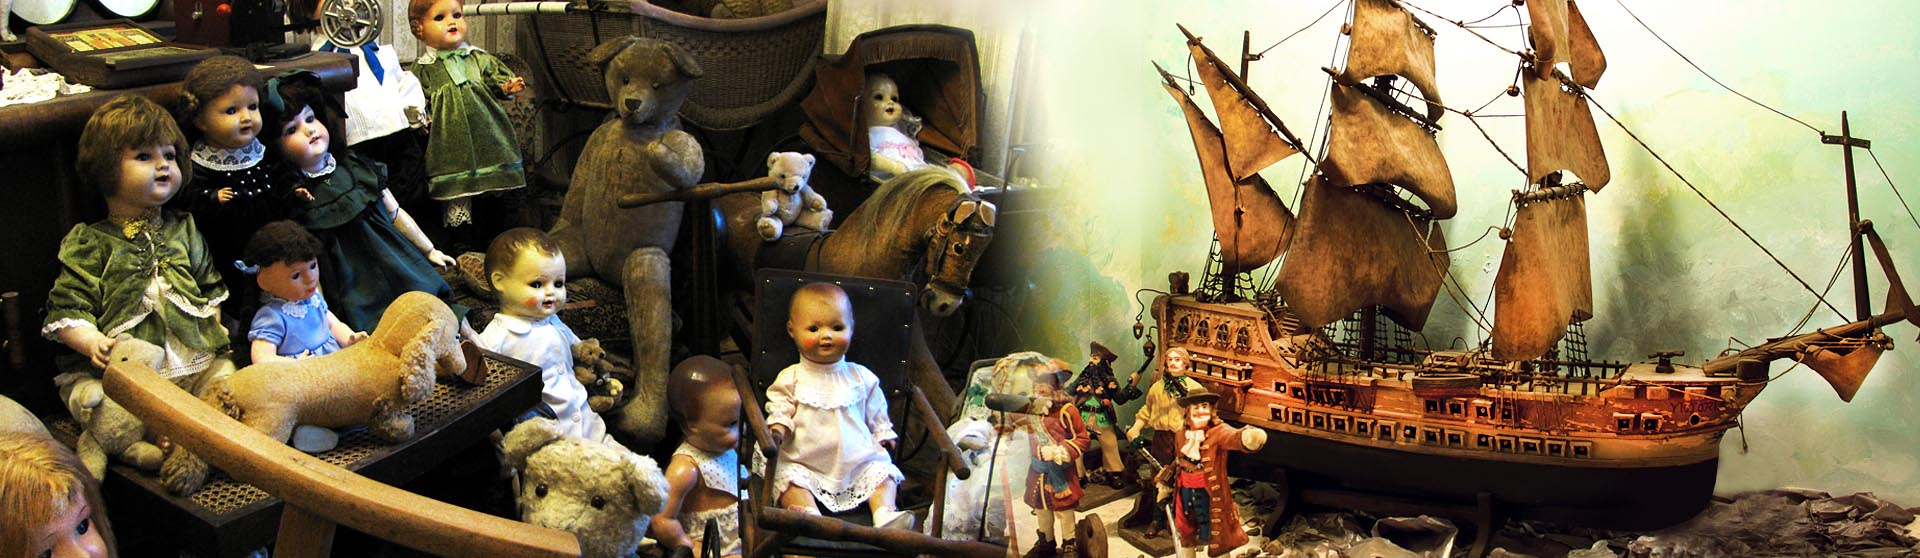 slide_muzeum_zabawek